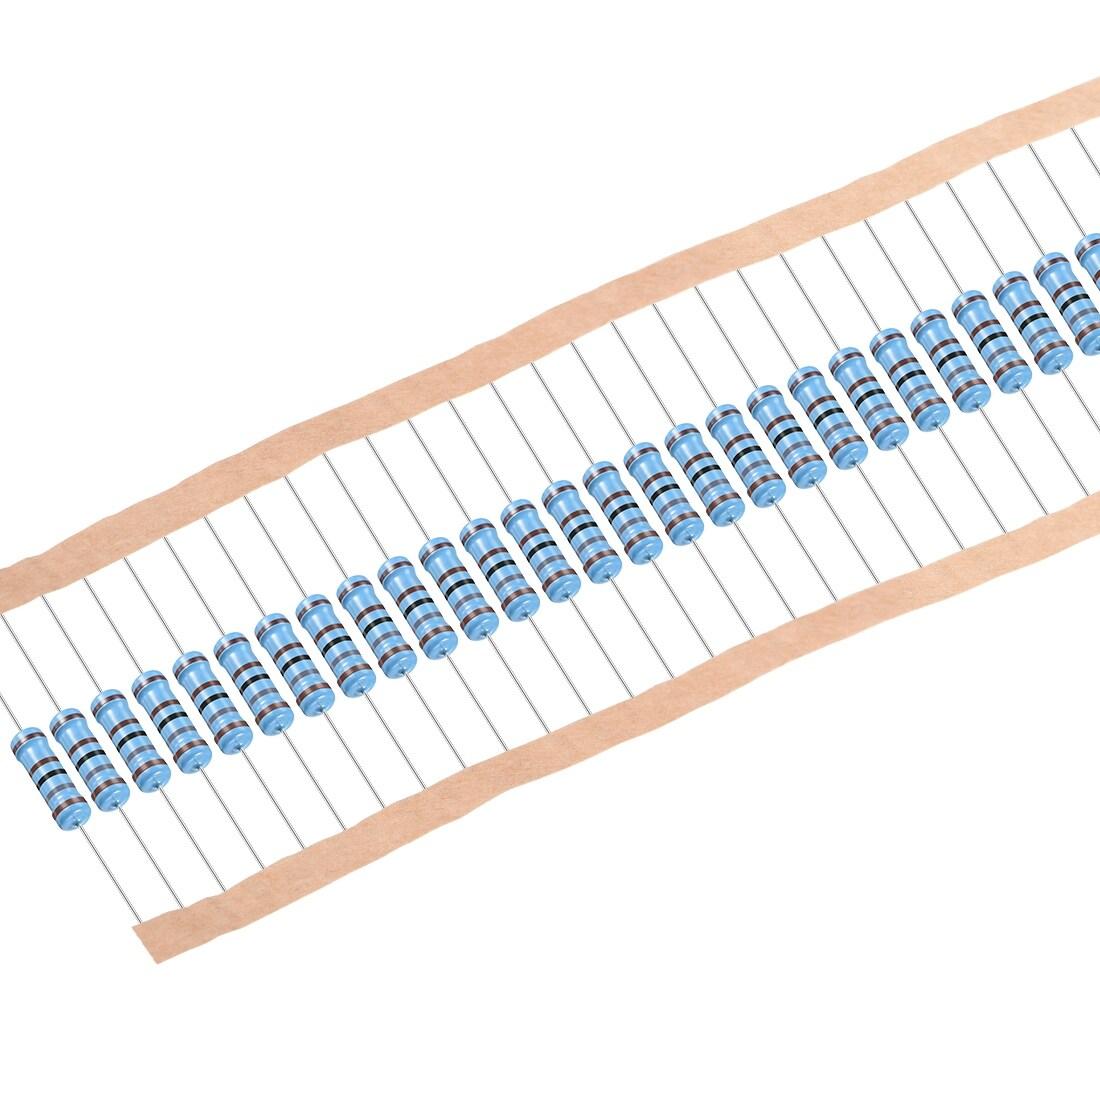 30pcs Metal Film Resistors 1.8K Ohm 2W 1%Tolerances 5 Color Bands